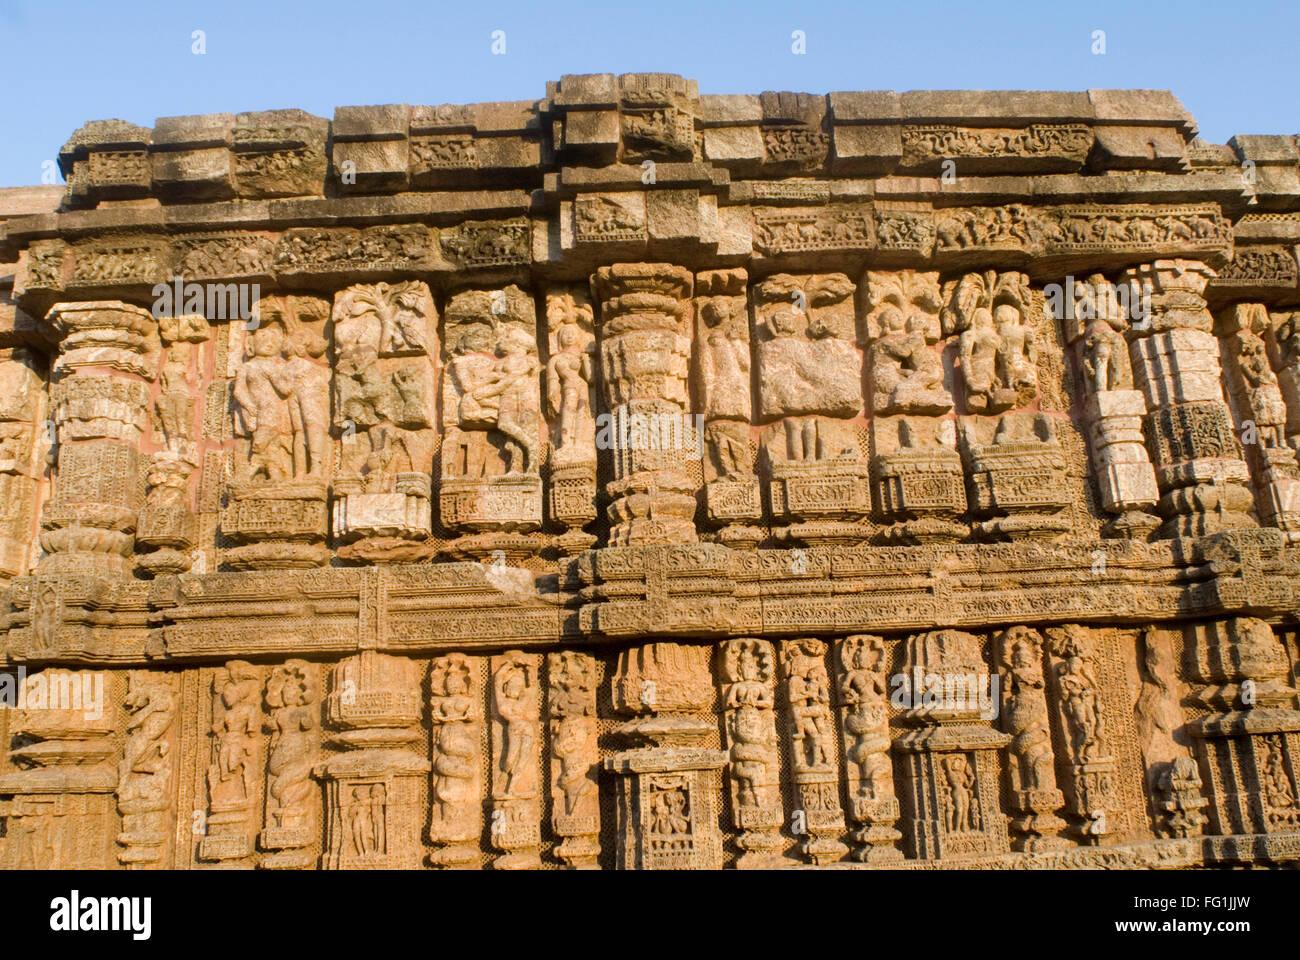 Wall of 13th century Sun temple carved with images representing everything mundane and mythological Konarak Orissa - Stock Image